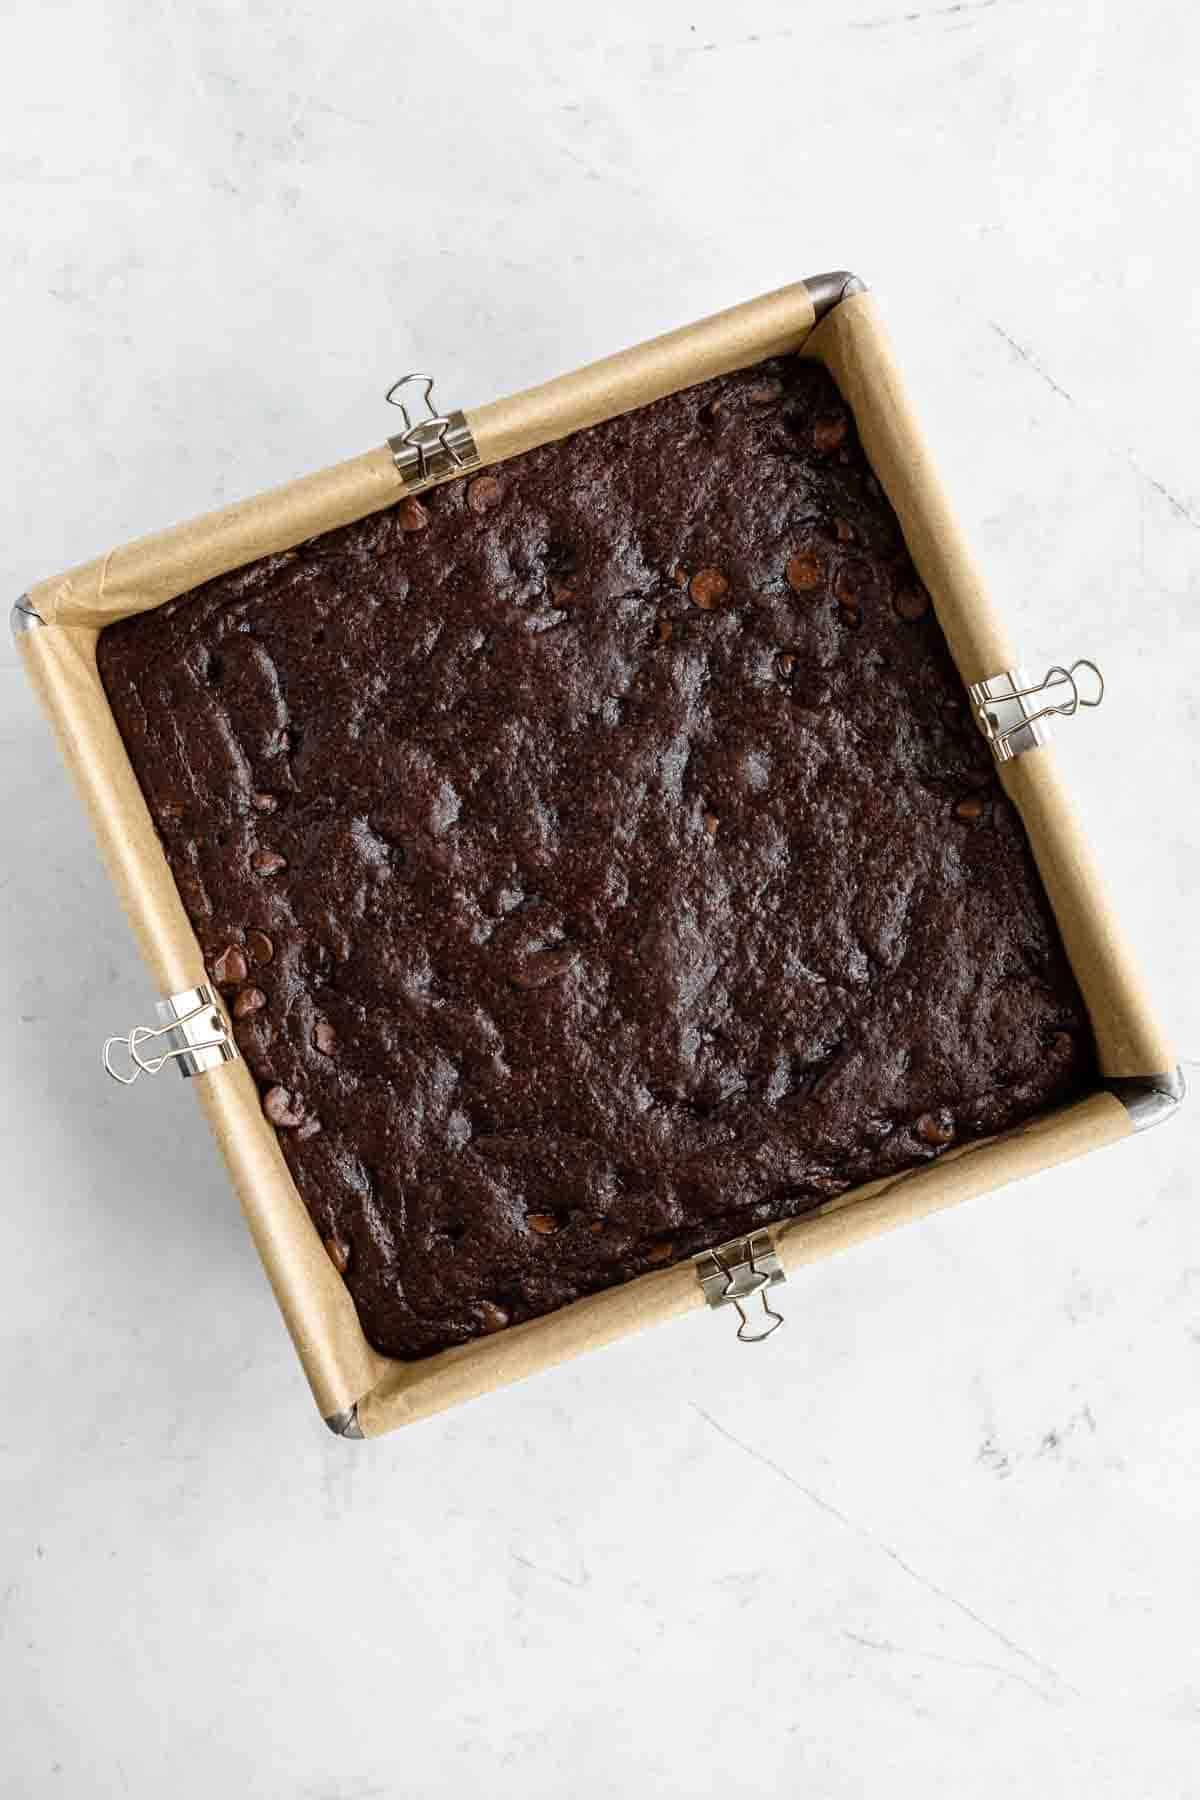 baked vegan brownies in a square baking dish